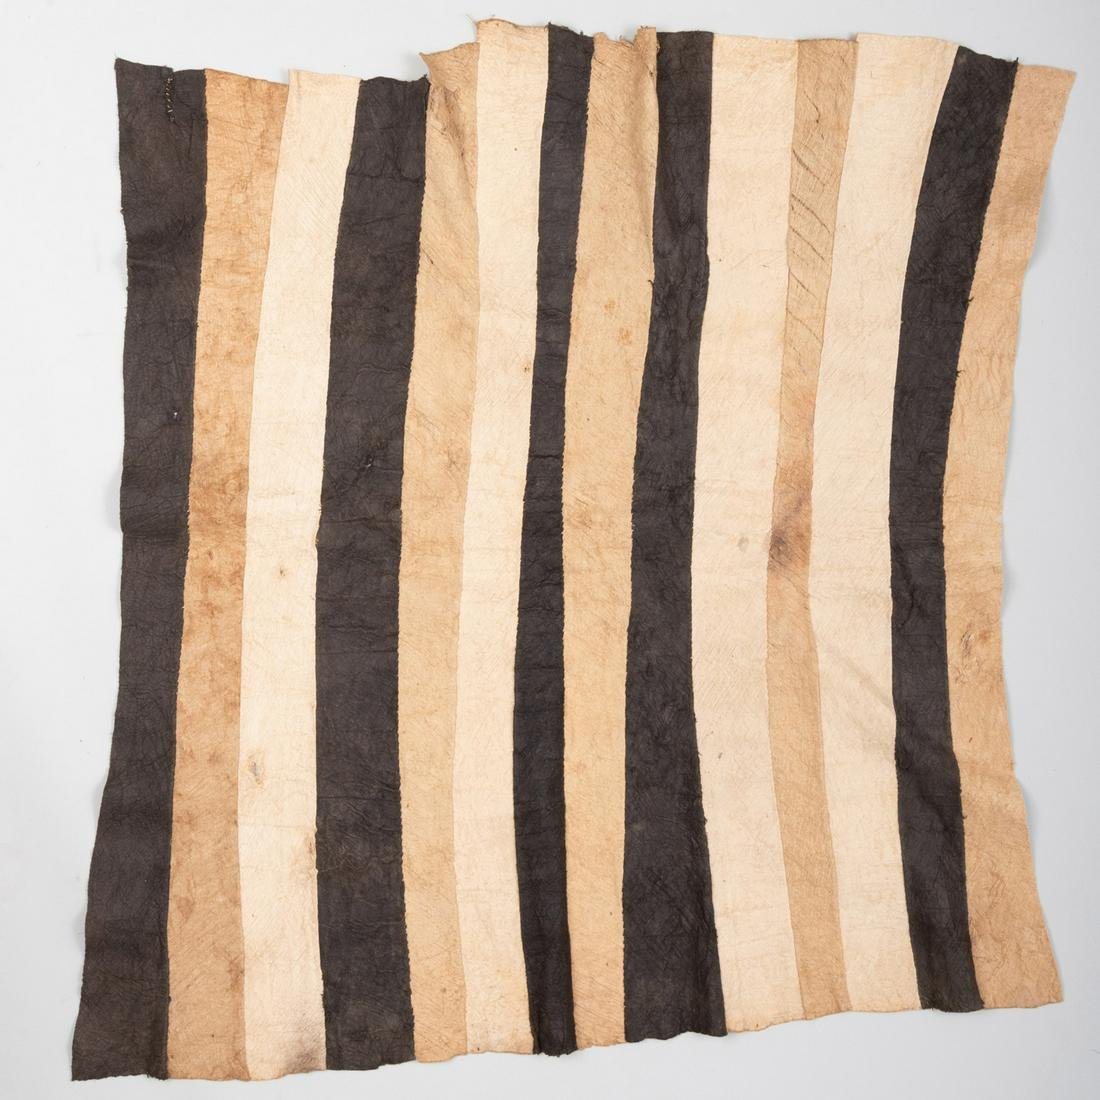 Three Mbuti Pygmy Bark Cloths, Ituri Rain Forest,